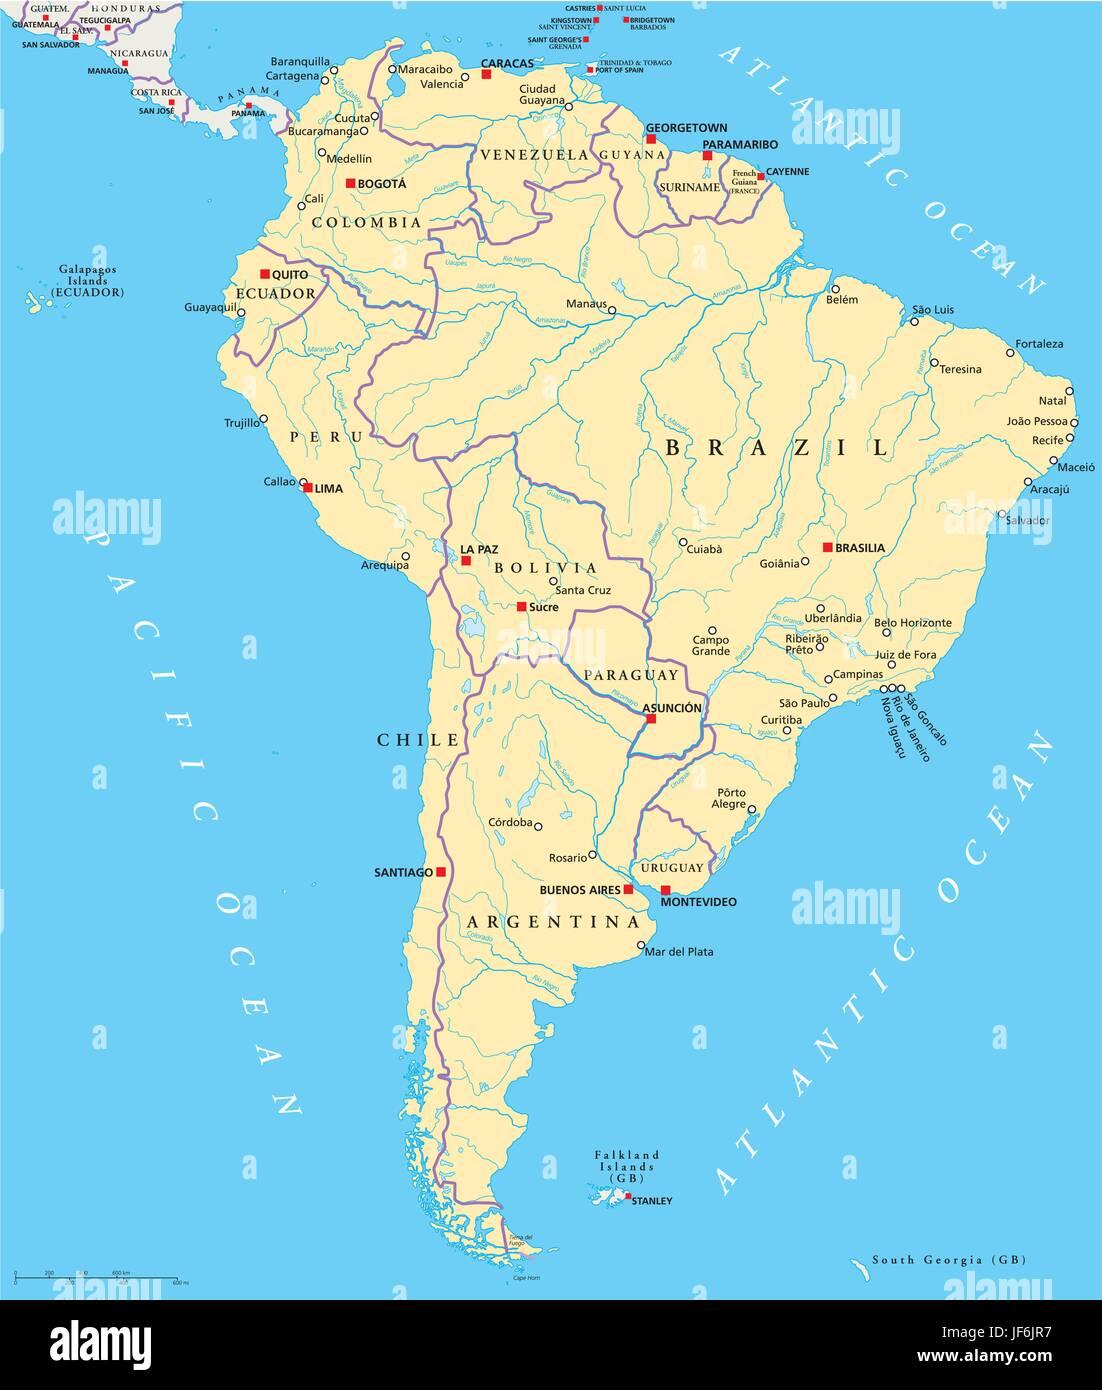 america brazil south america continent venezuela states map